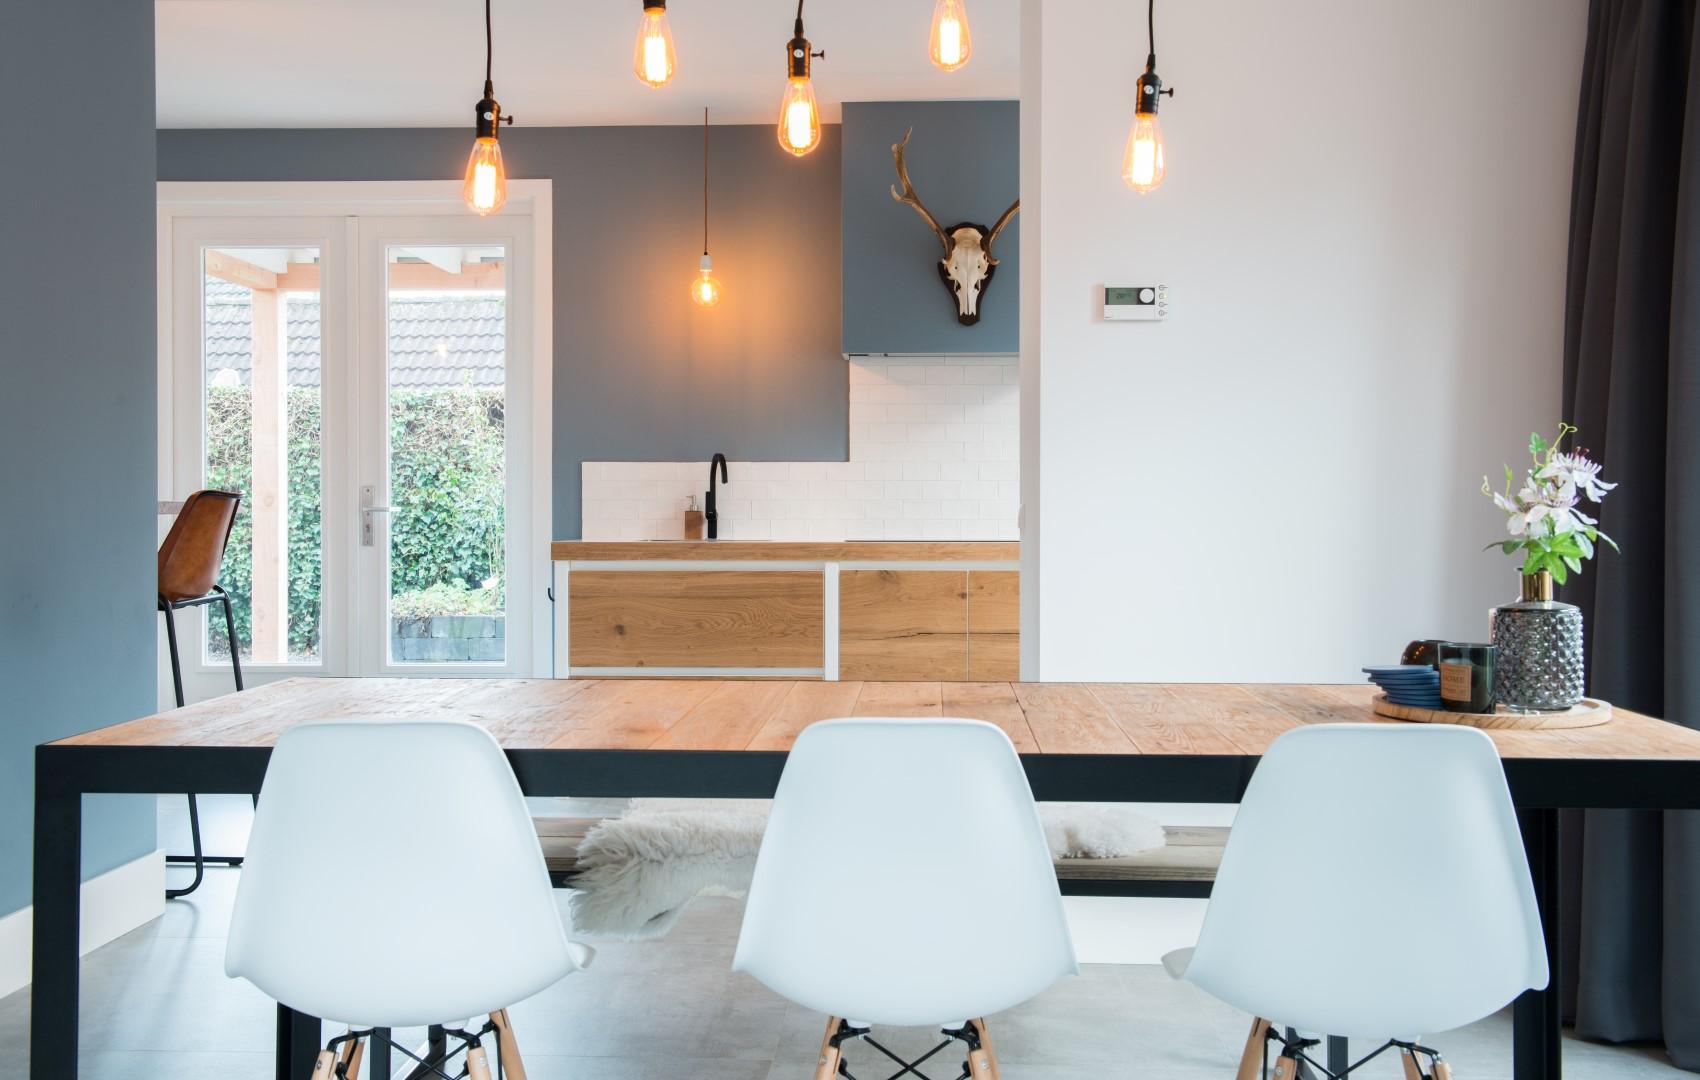 Woonkamertafel petersen keuken interieur Woonkamer tafel